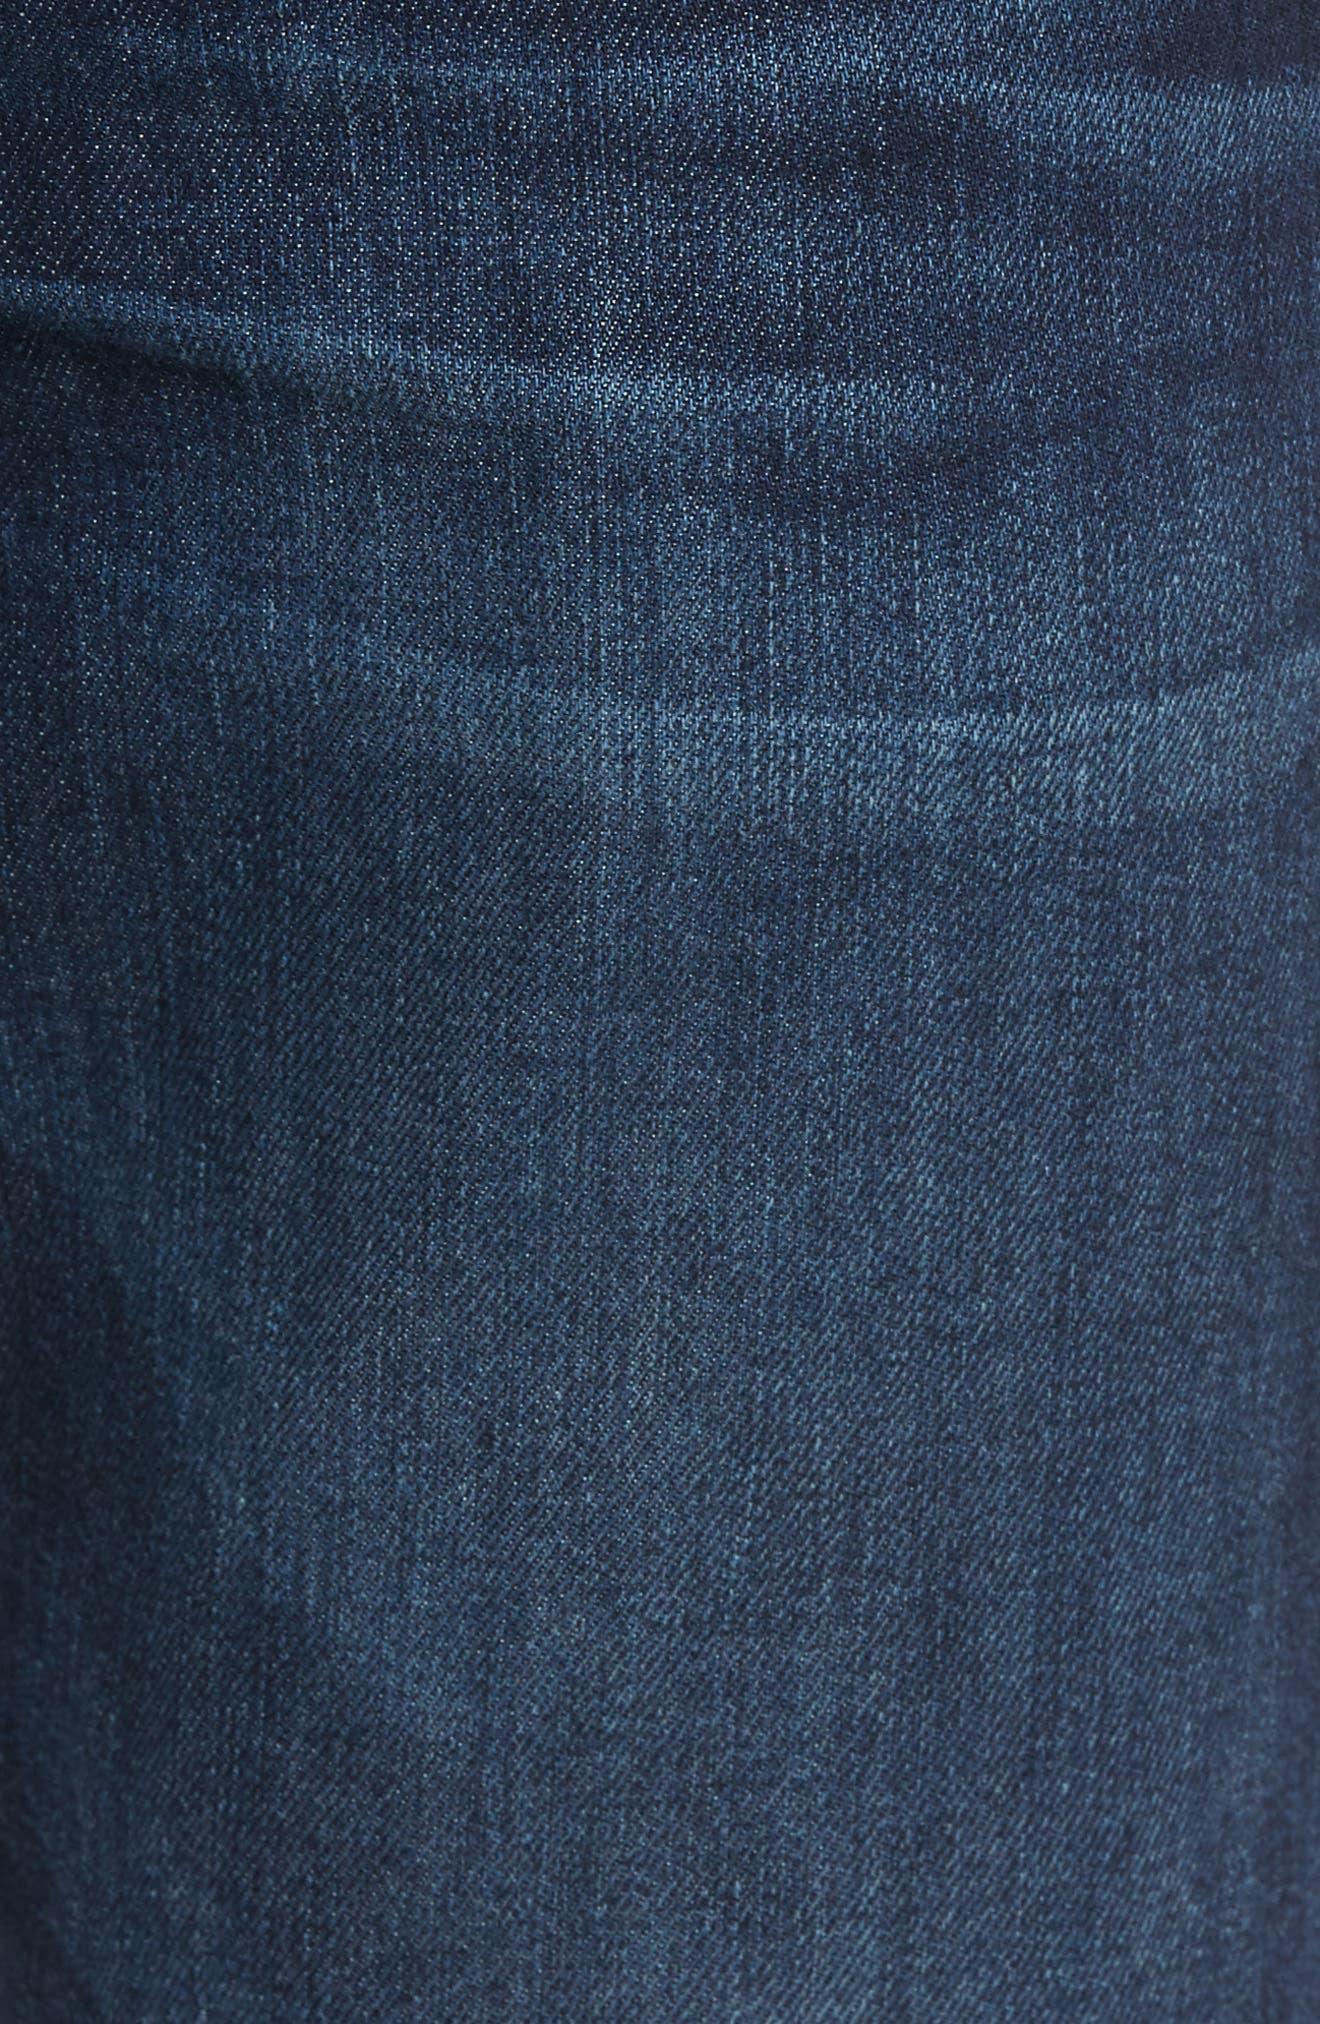 Slim Fit Jeans,                             Alternate thumbnail 5, color,                             Izaak